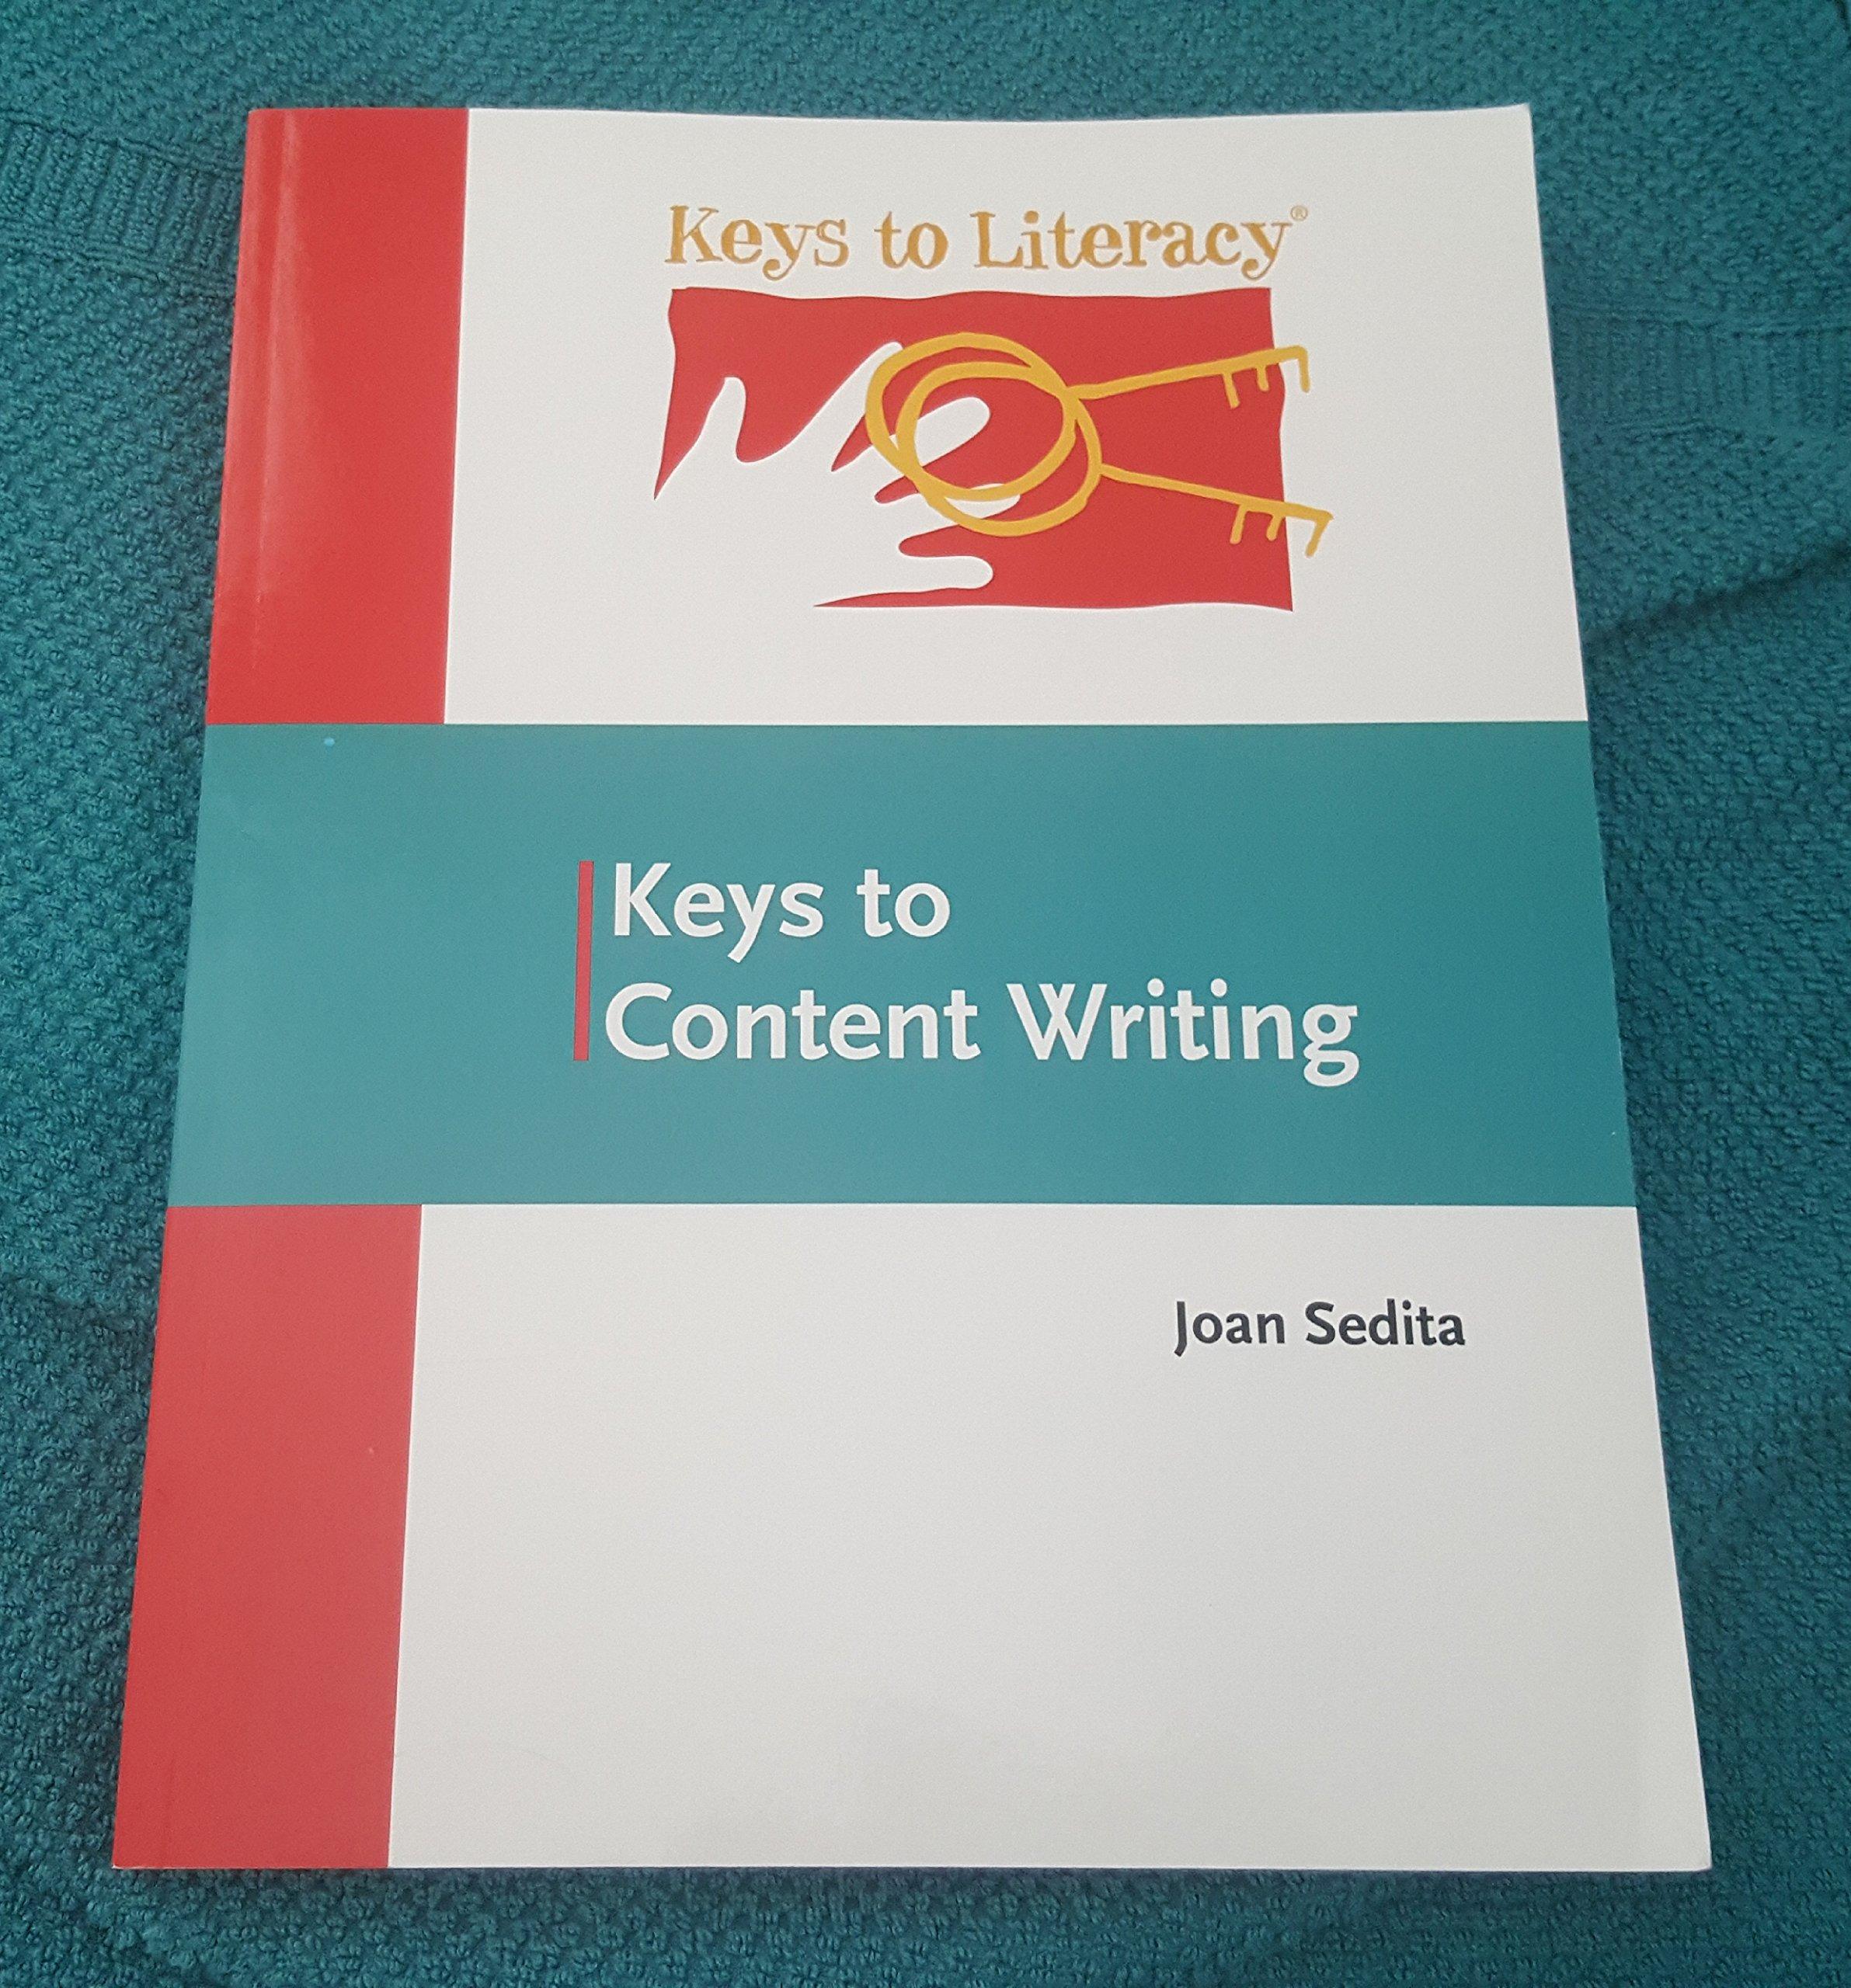 Training book: keys to content writing (3rd edition, 2018) keys.